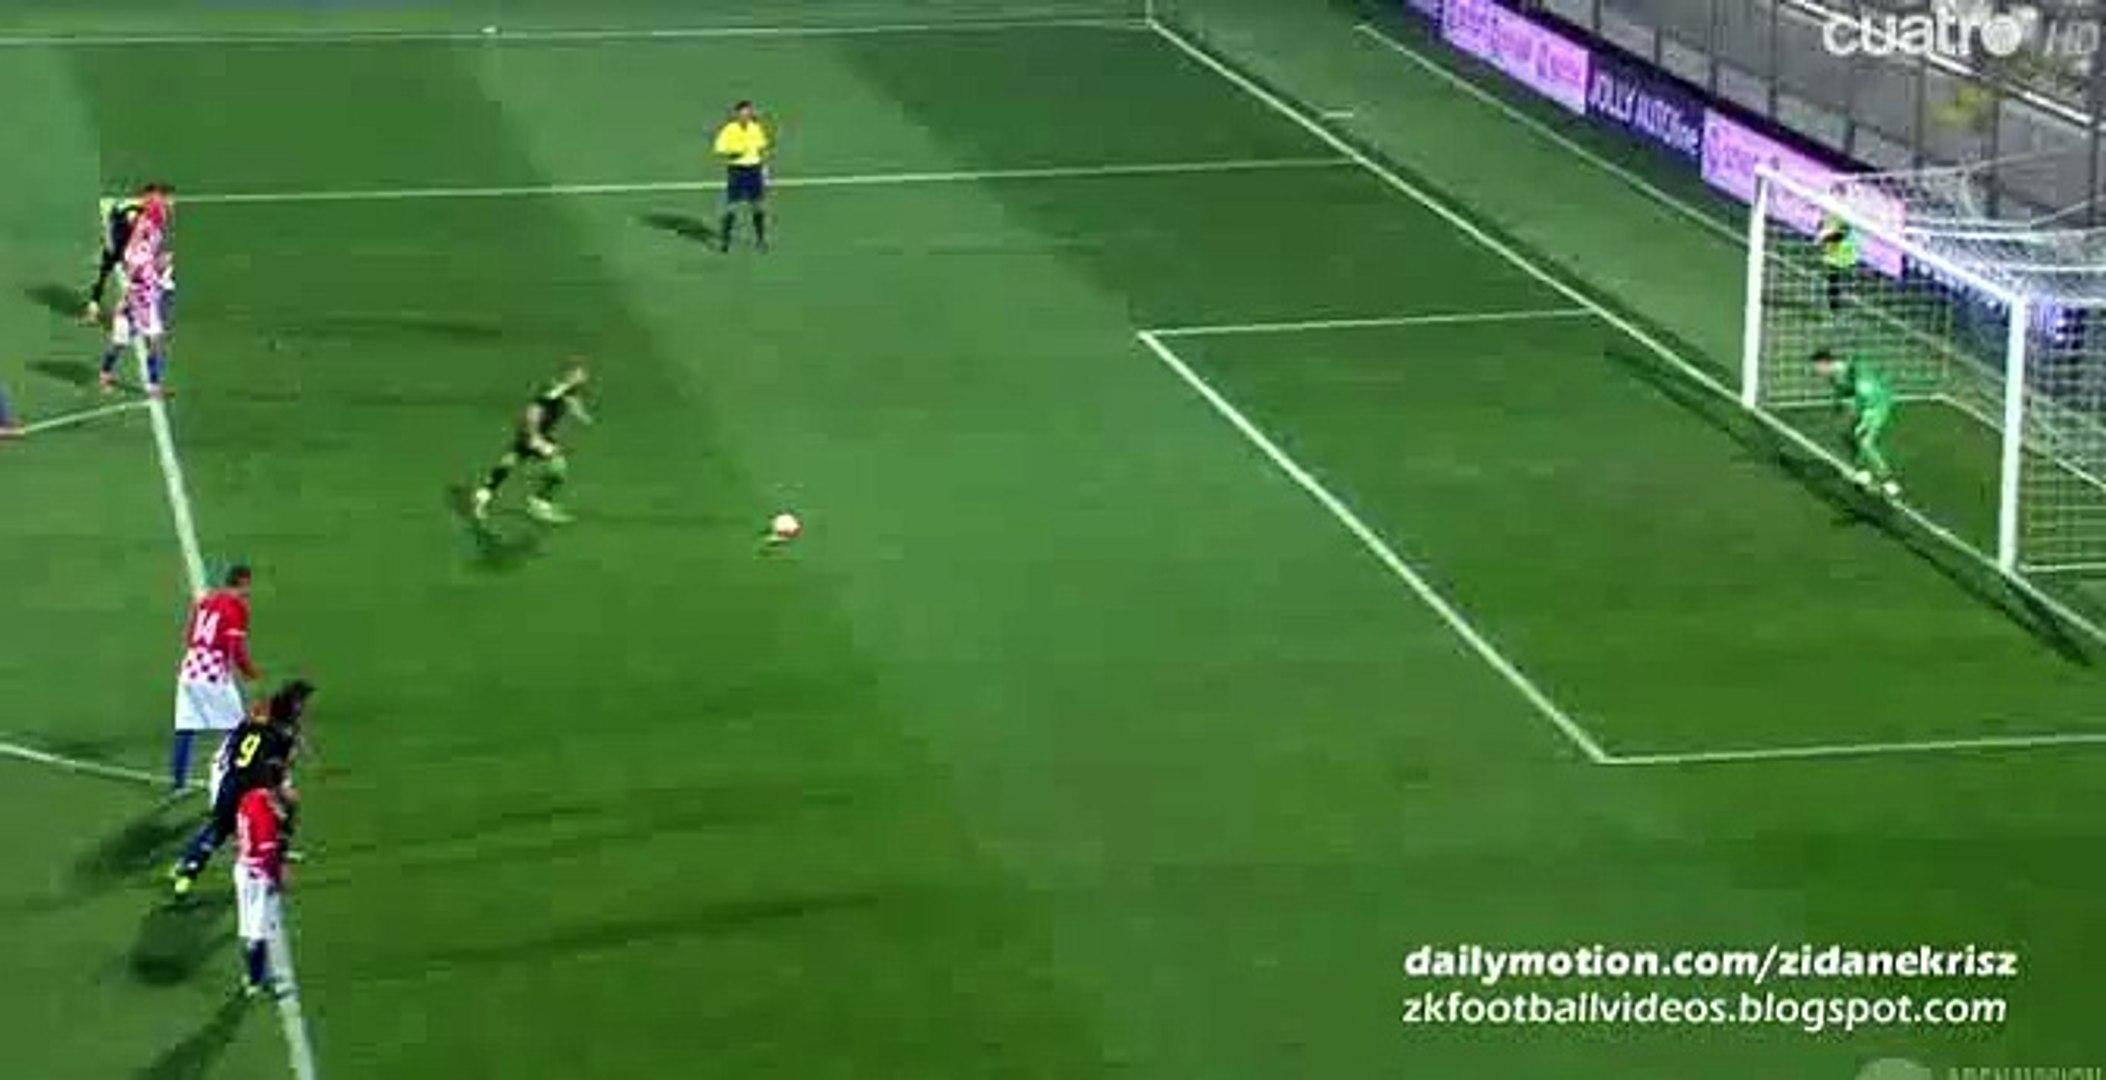 0-1 Gerard Deulofeu Goal - Croatia v. Spain U21 European Championship 17.11.2015 HD